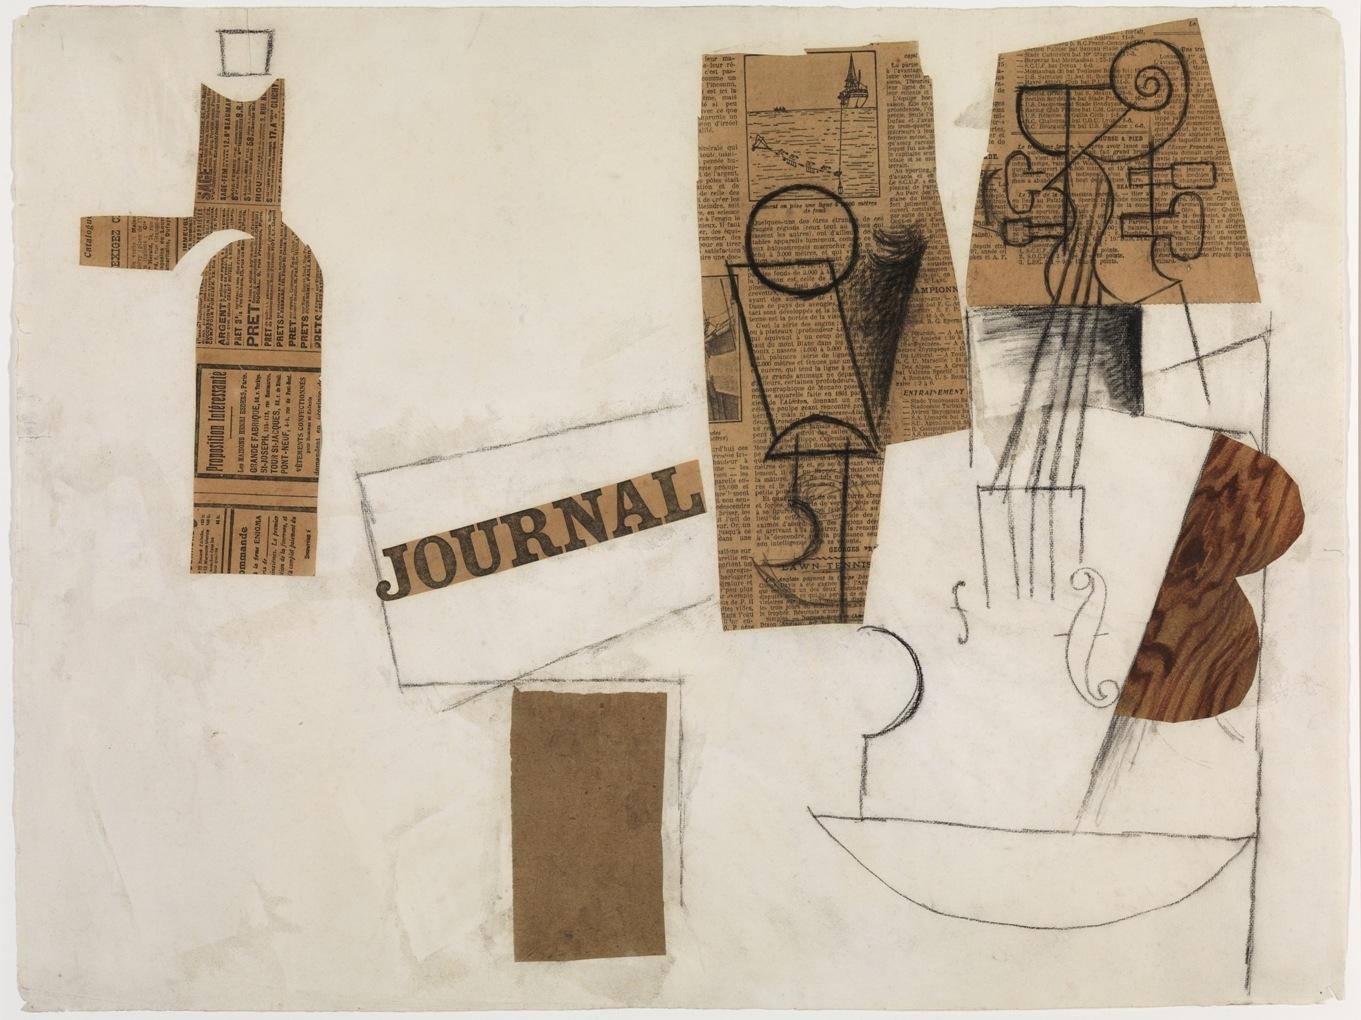 Siphon, Glass, Newspaper, and Violin. Paris image